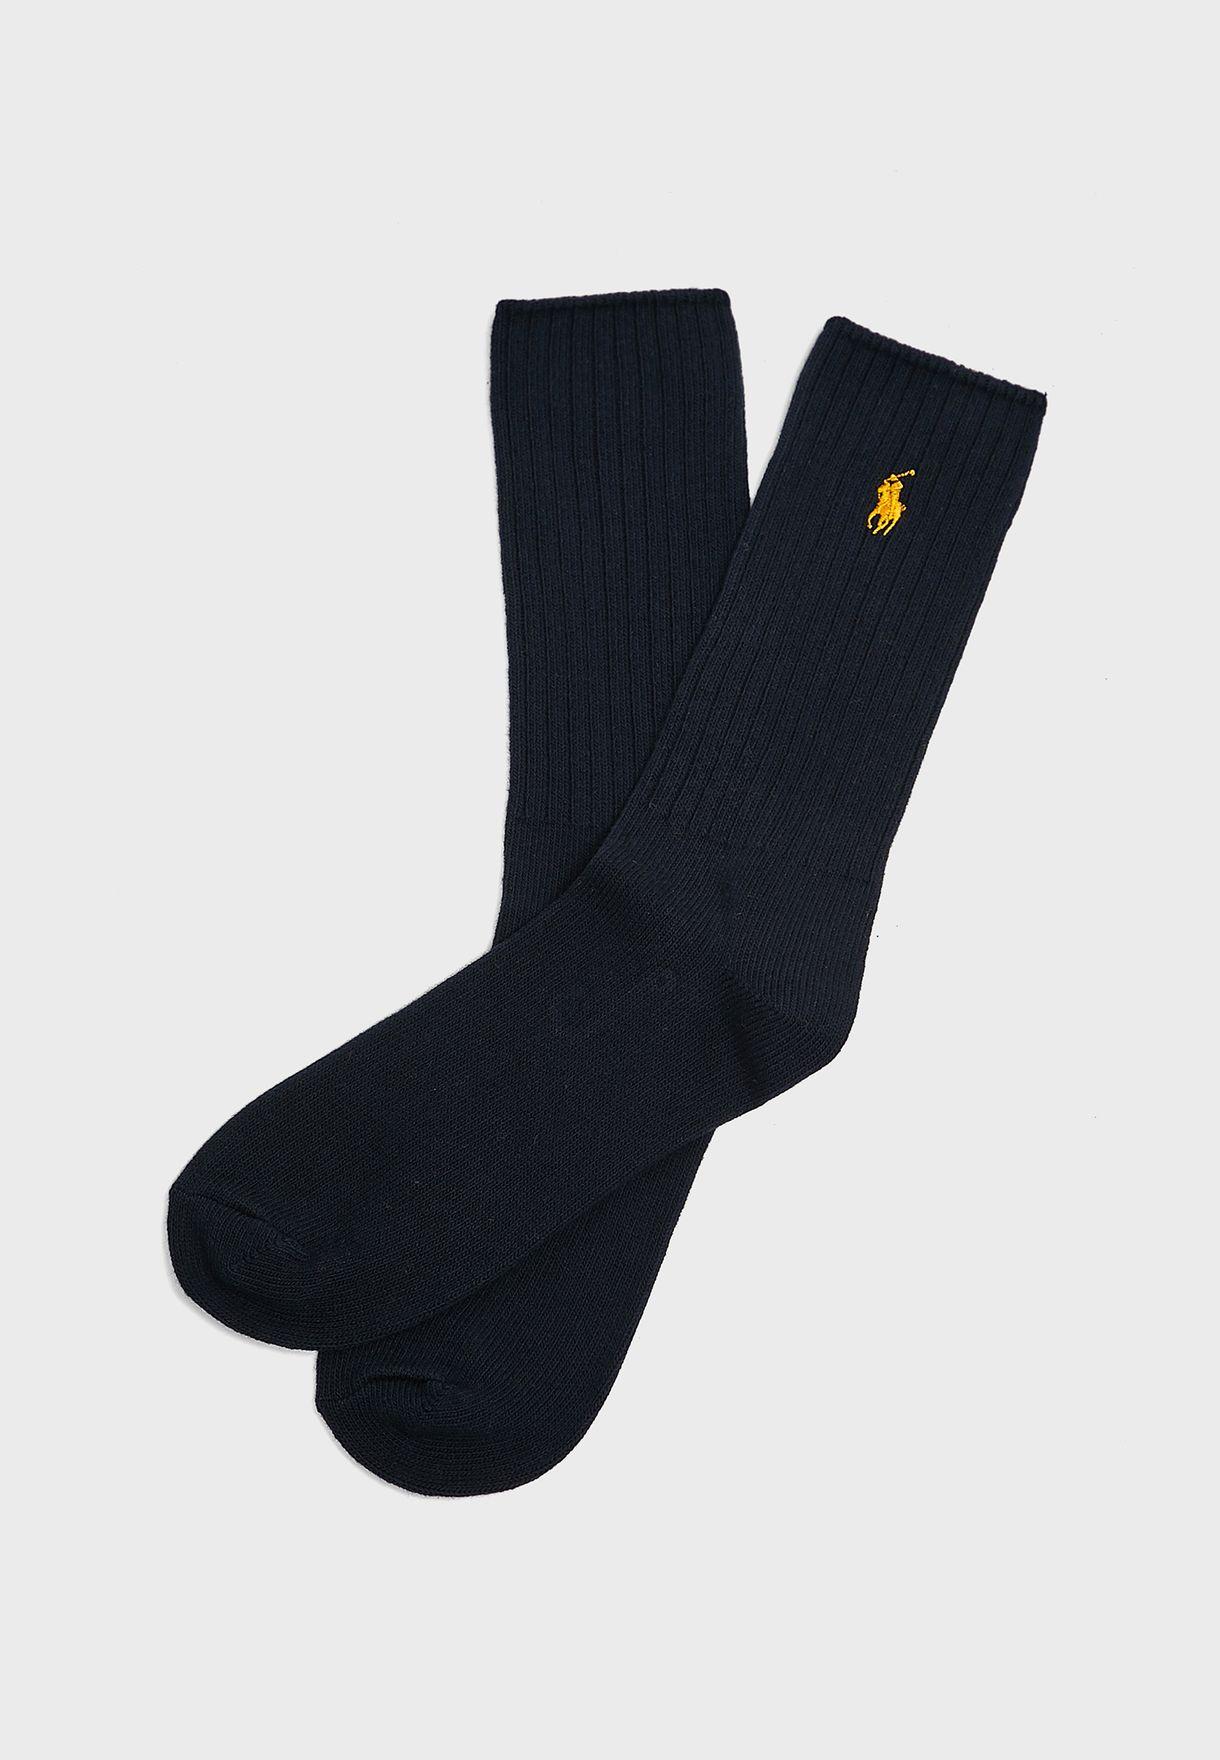 3 Pack Assorted Crew Socks